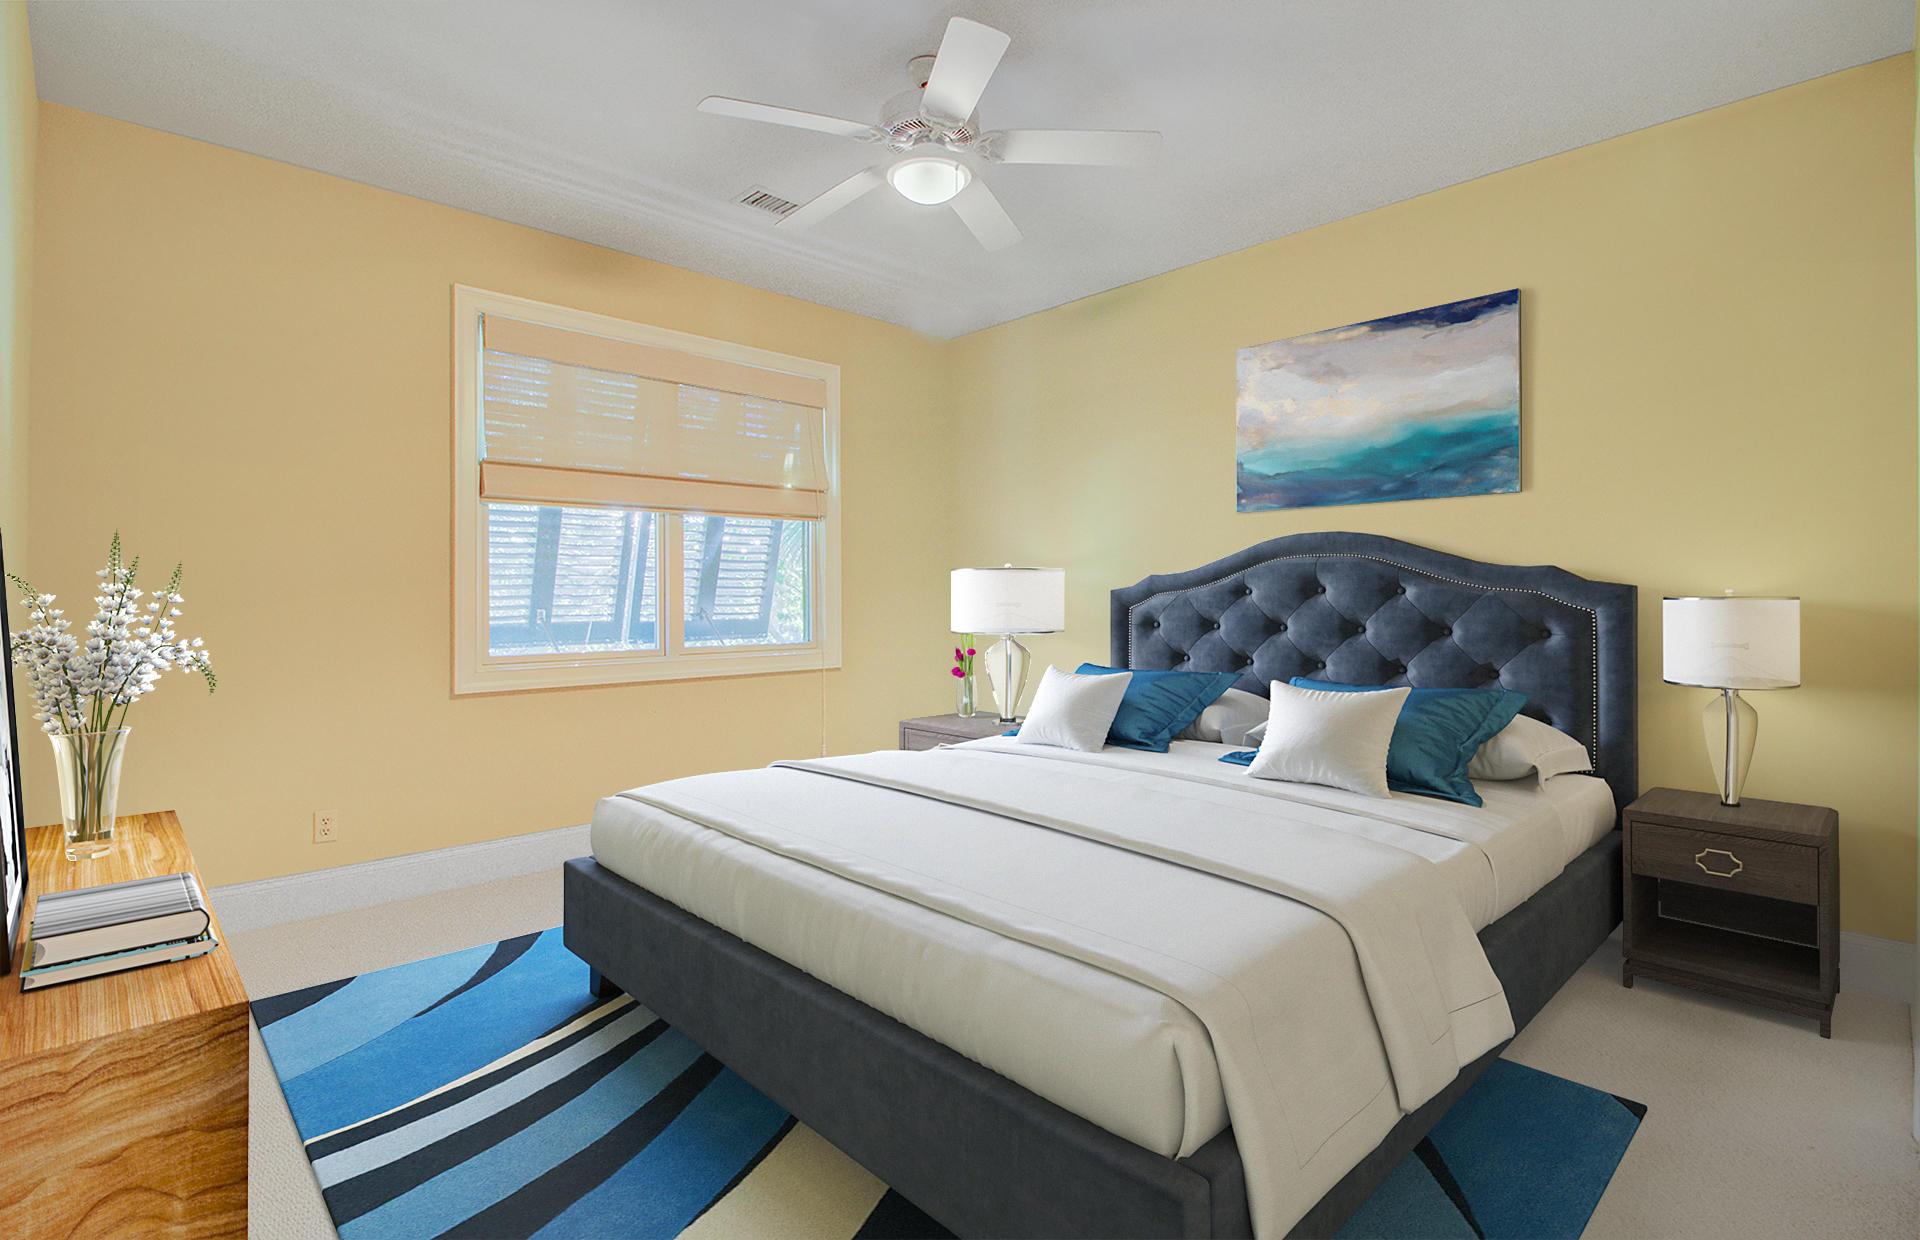 Kiawah Island Homes For Sale - 402 Ocean Oaks, Kiawah Island, SC - 20